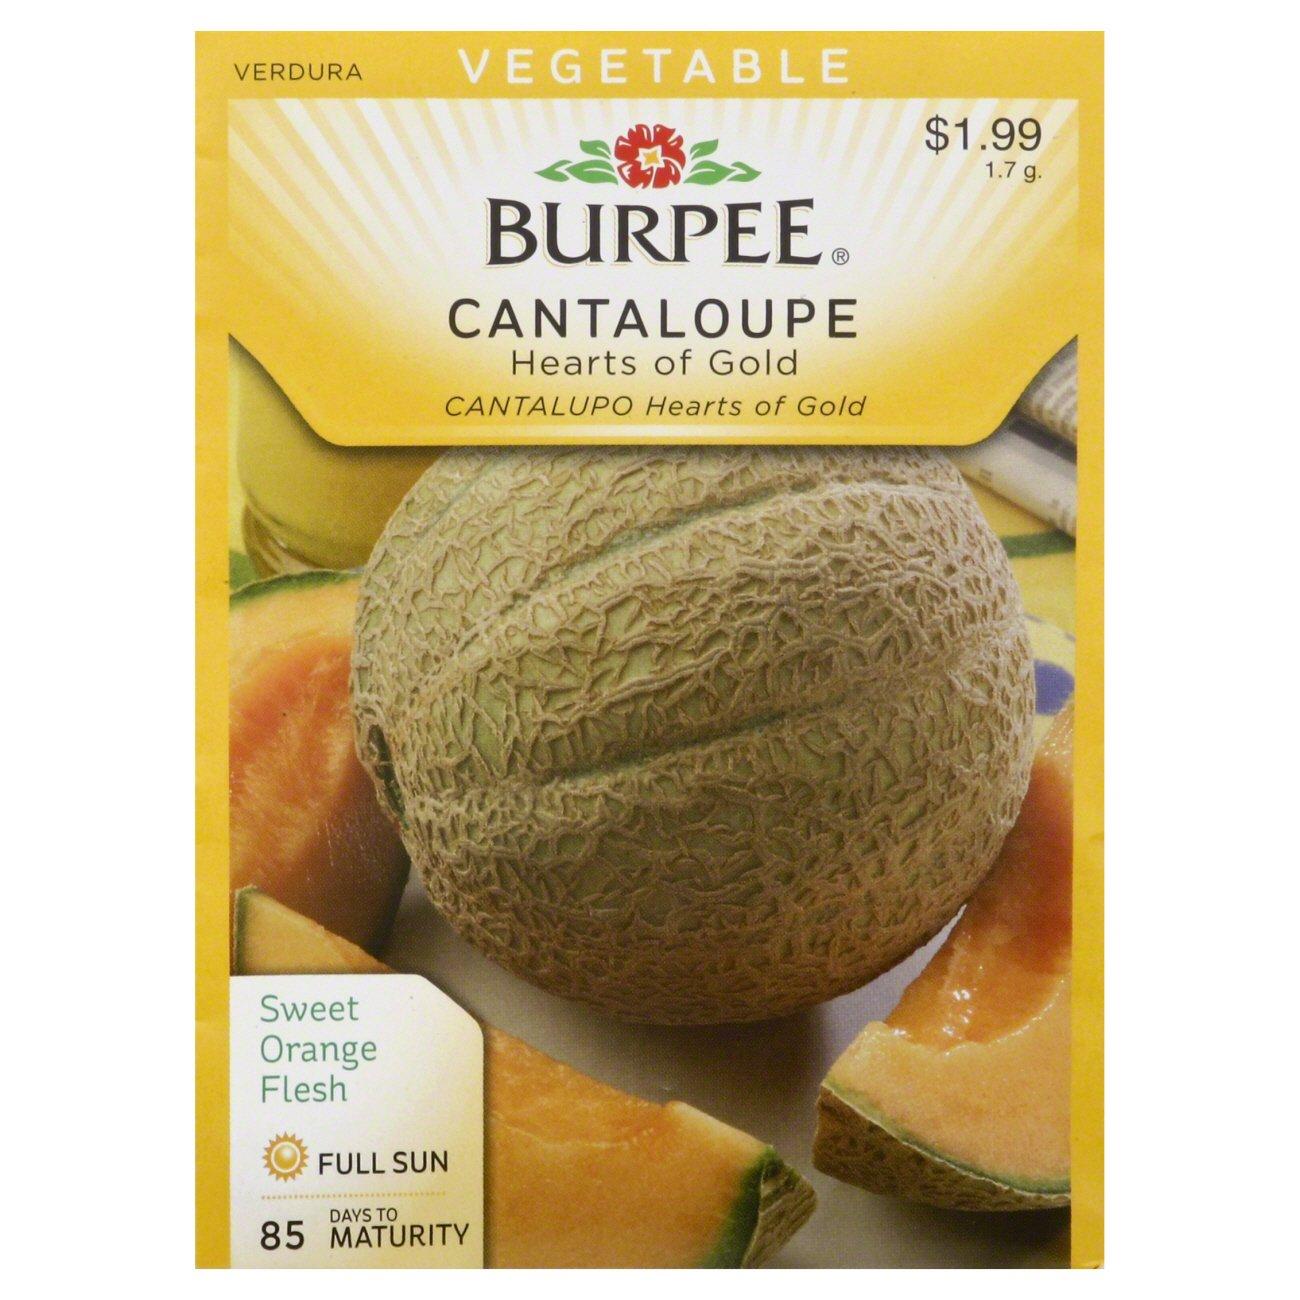 Burpee Cantaloupe Seeds Hearts Of Gold Shop Seeds At H E B Origin of the word cantaloupe. heb com